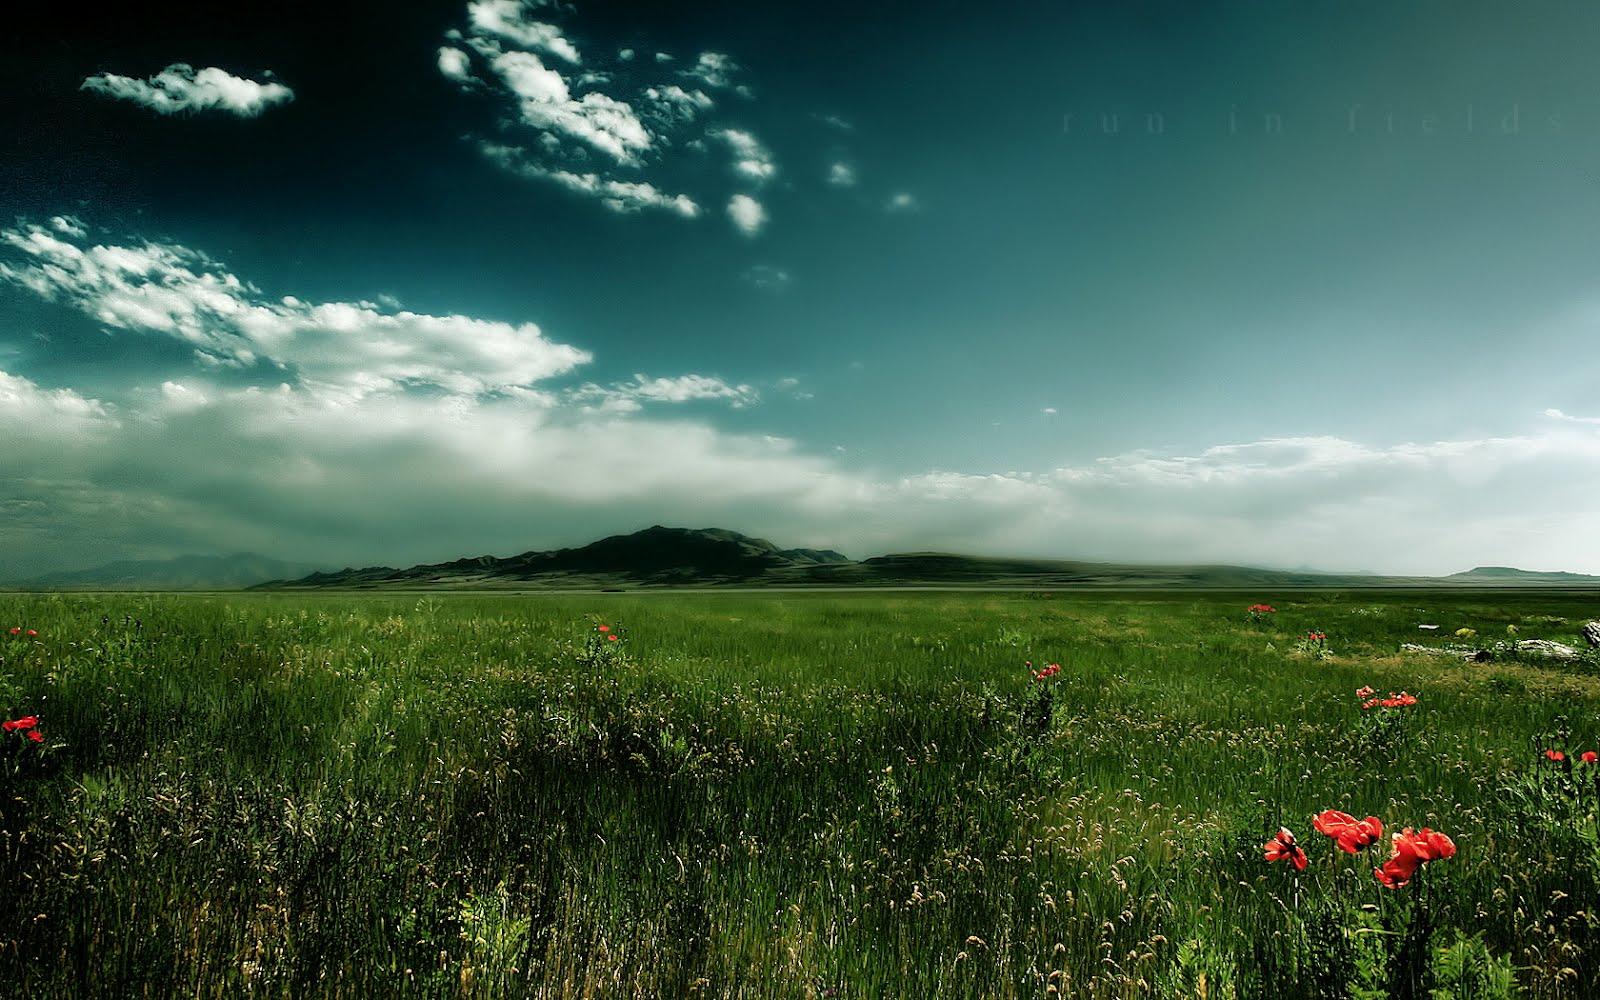 http://1.bp.blogspot.com/-XLRxw9tUDqY/T0d5uaqCQsI/AAAAAAAAH6Y/CEk_ZV3Q3Gw/s1600/best-hd-wallpapers.jpg